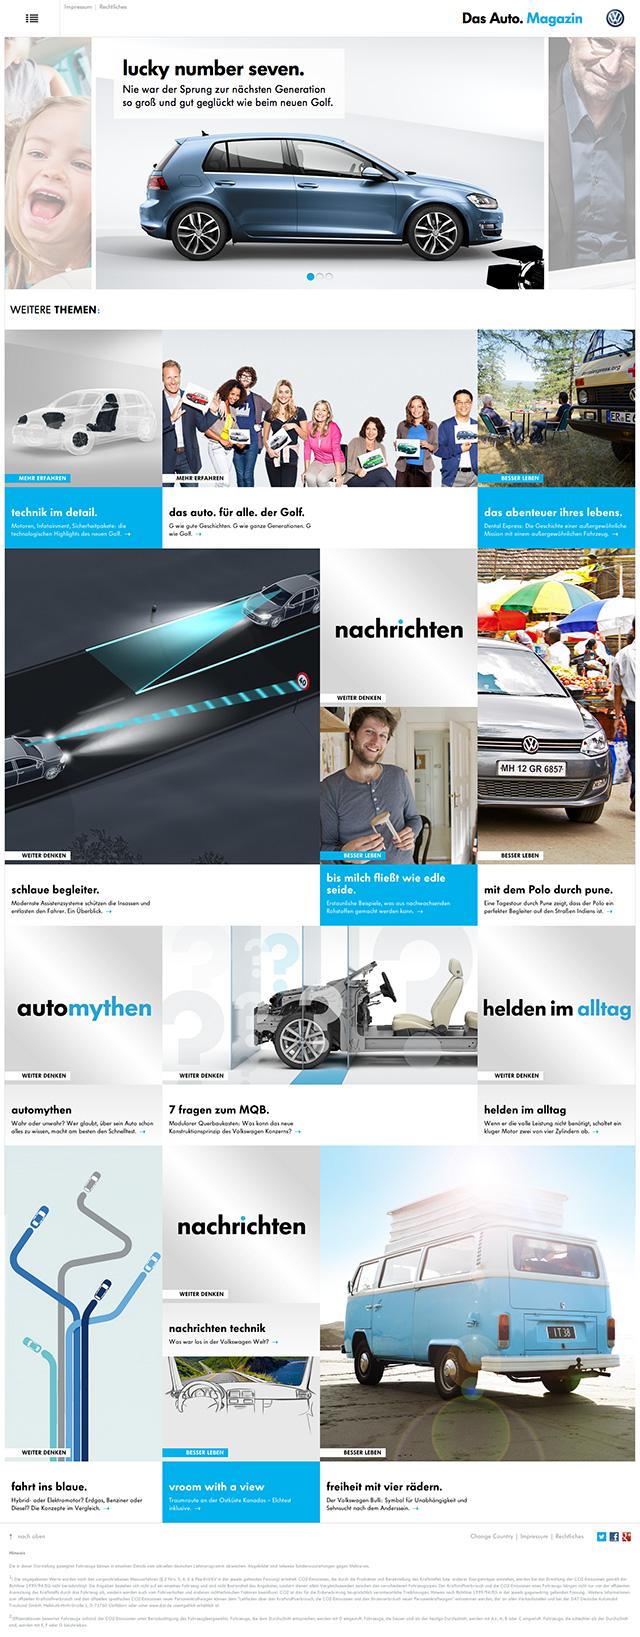 VW Das Auto Magazine Frontpage